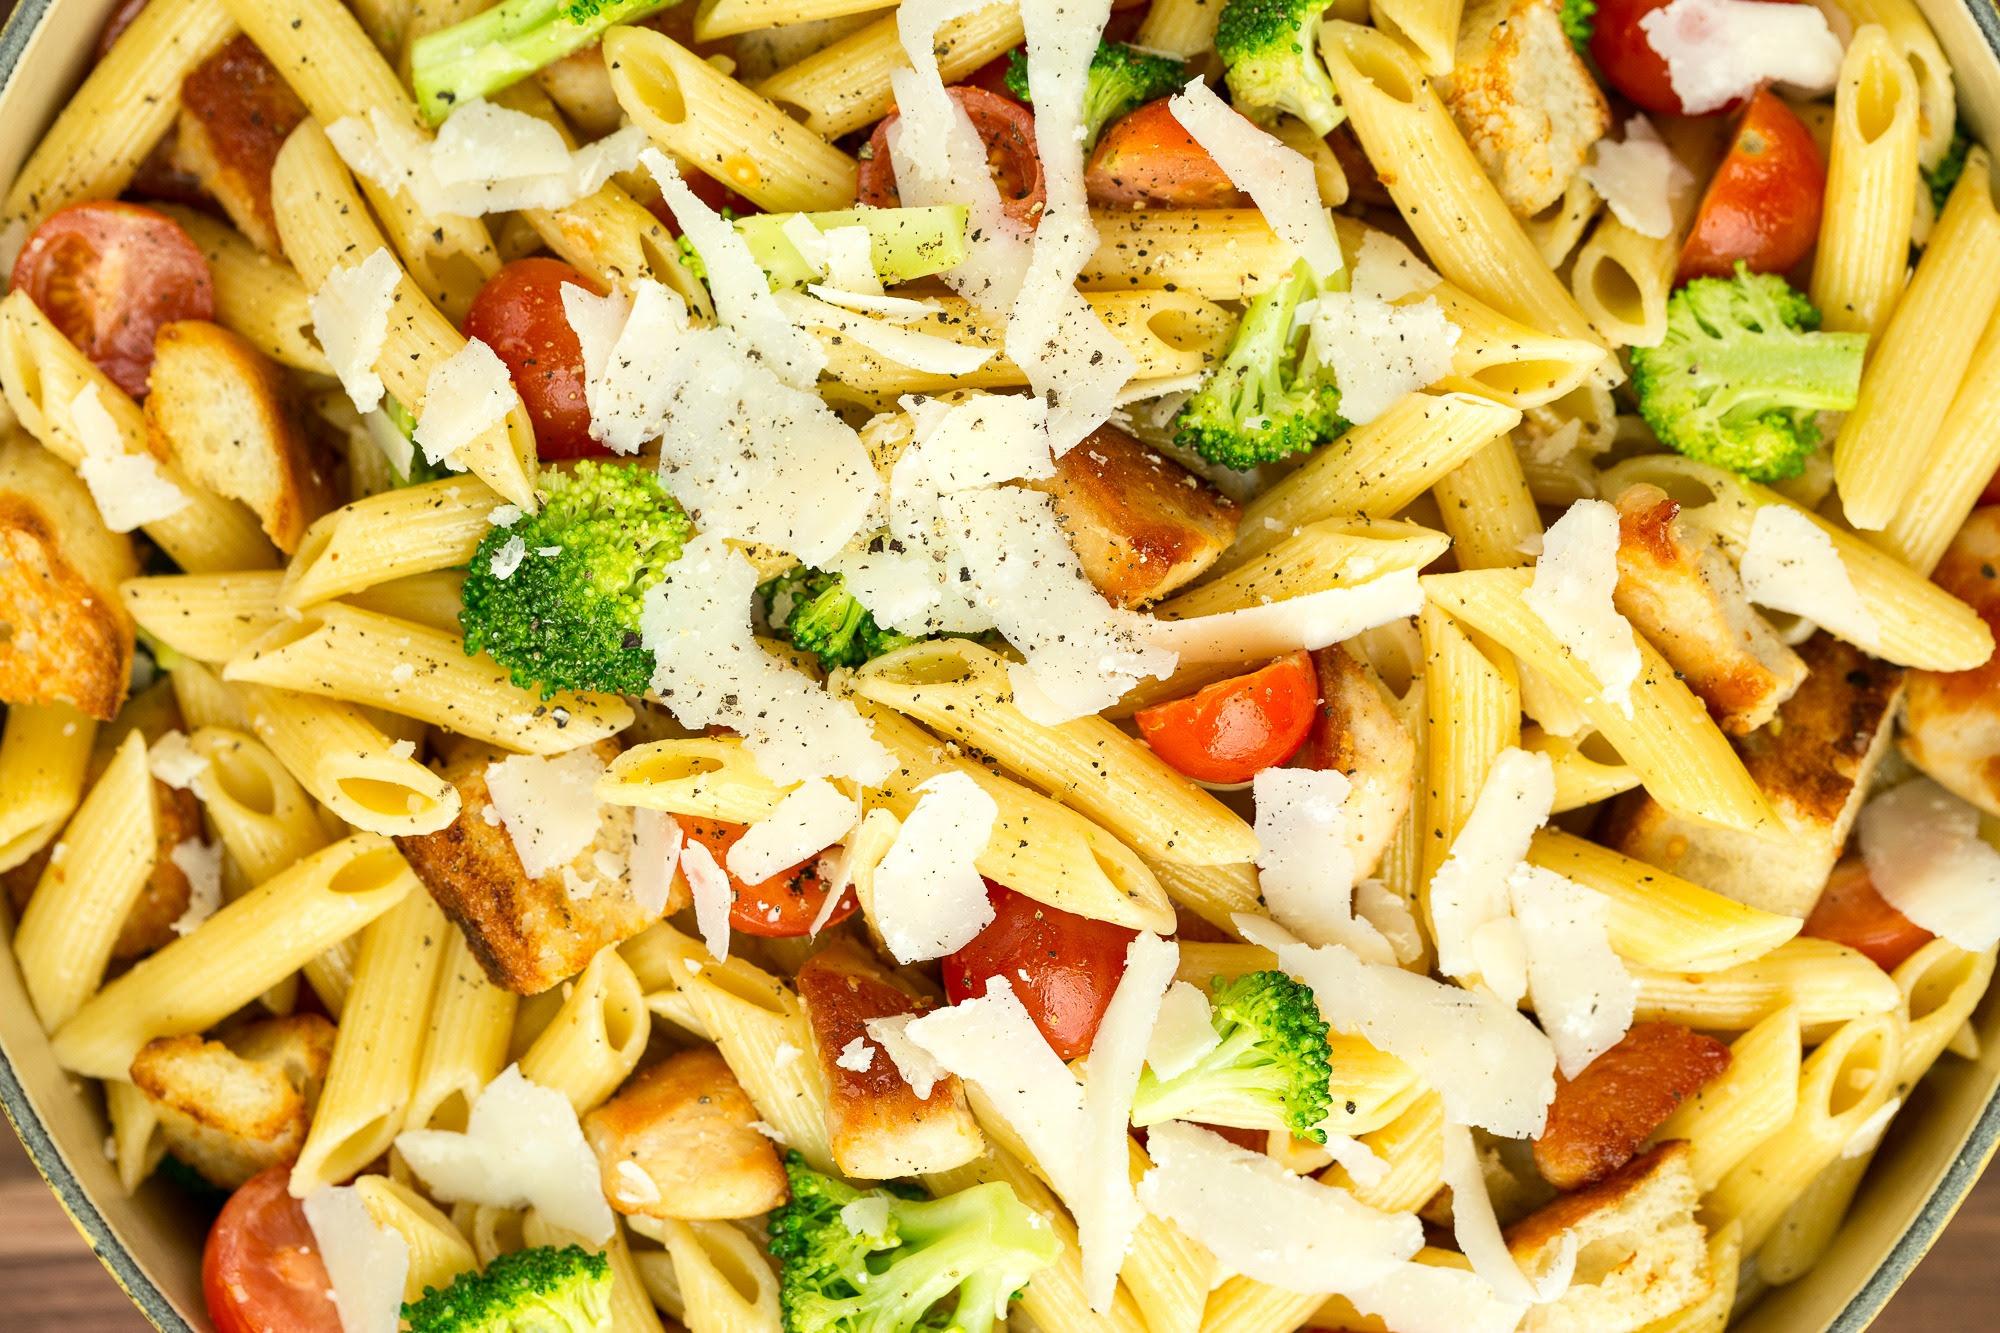 30+ Easy Pasta Salad Recipes - Best Ideas for Pasta Salads ...